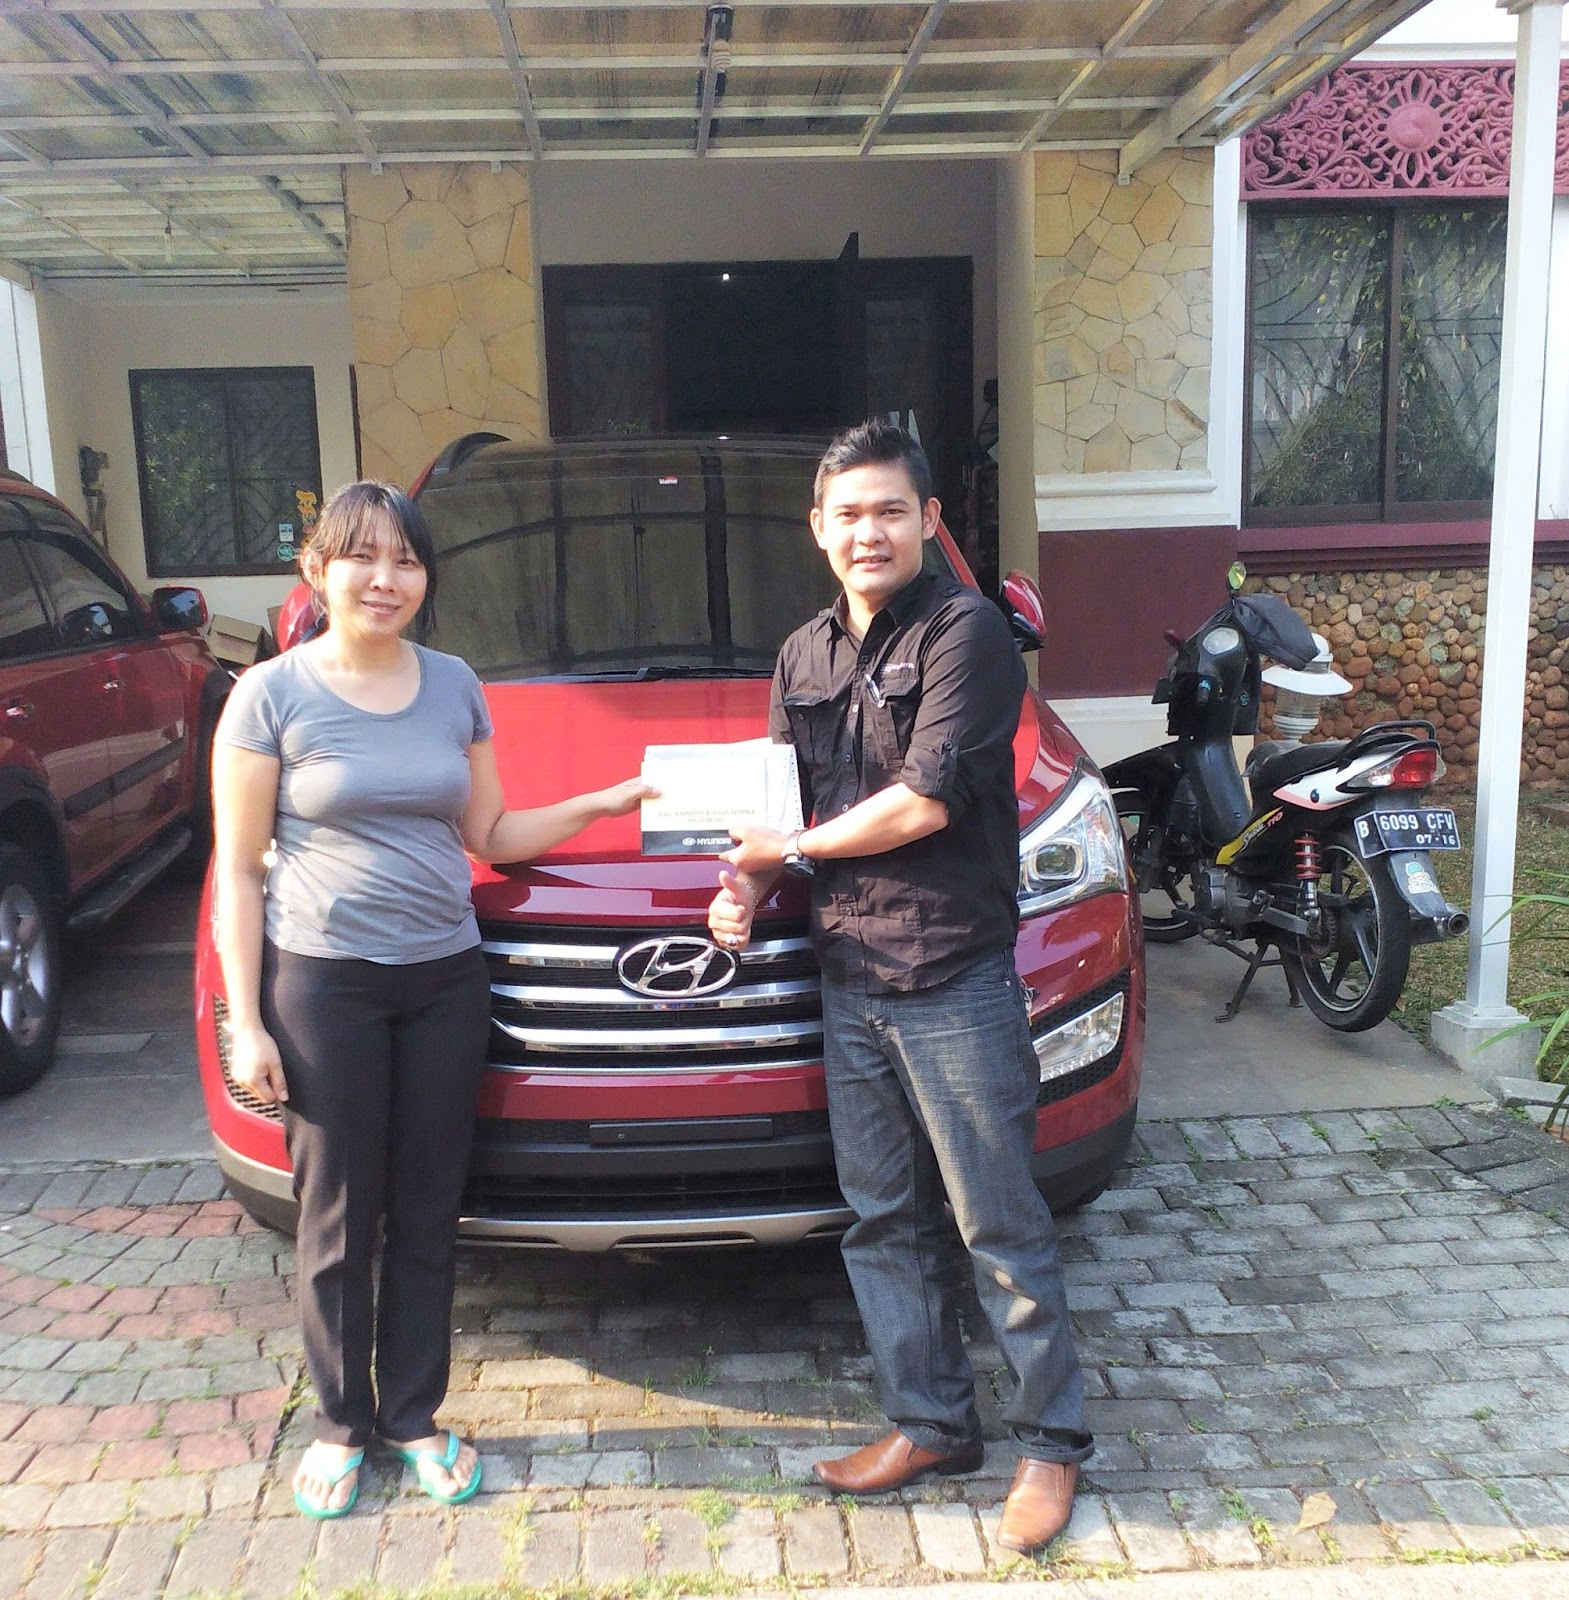 Harga Mobil Hyundai satafe